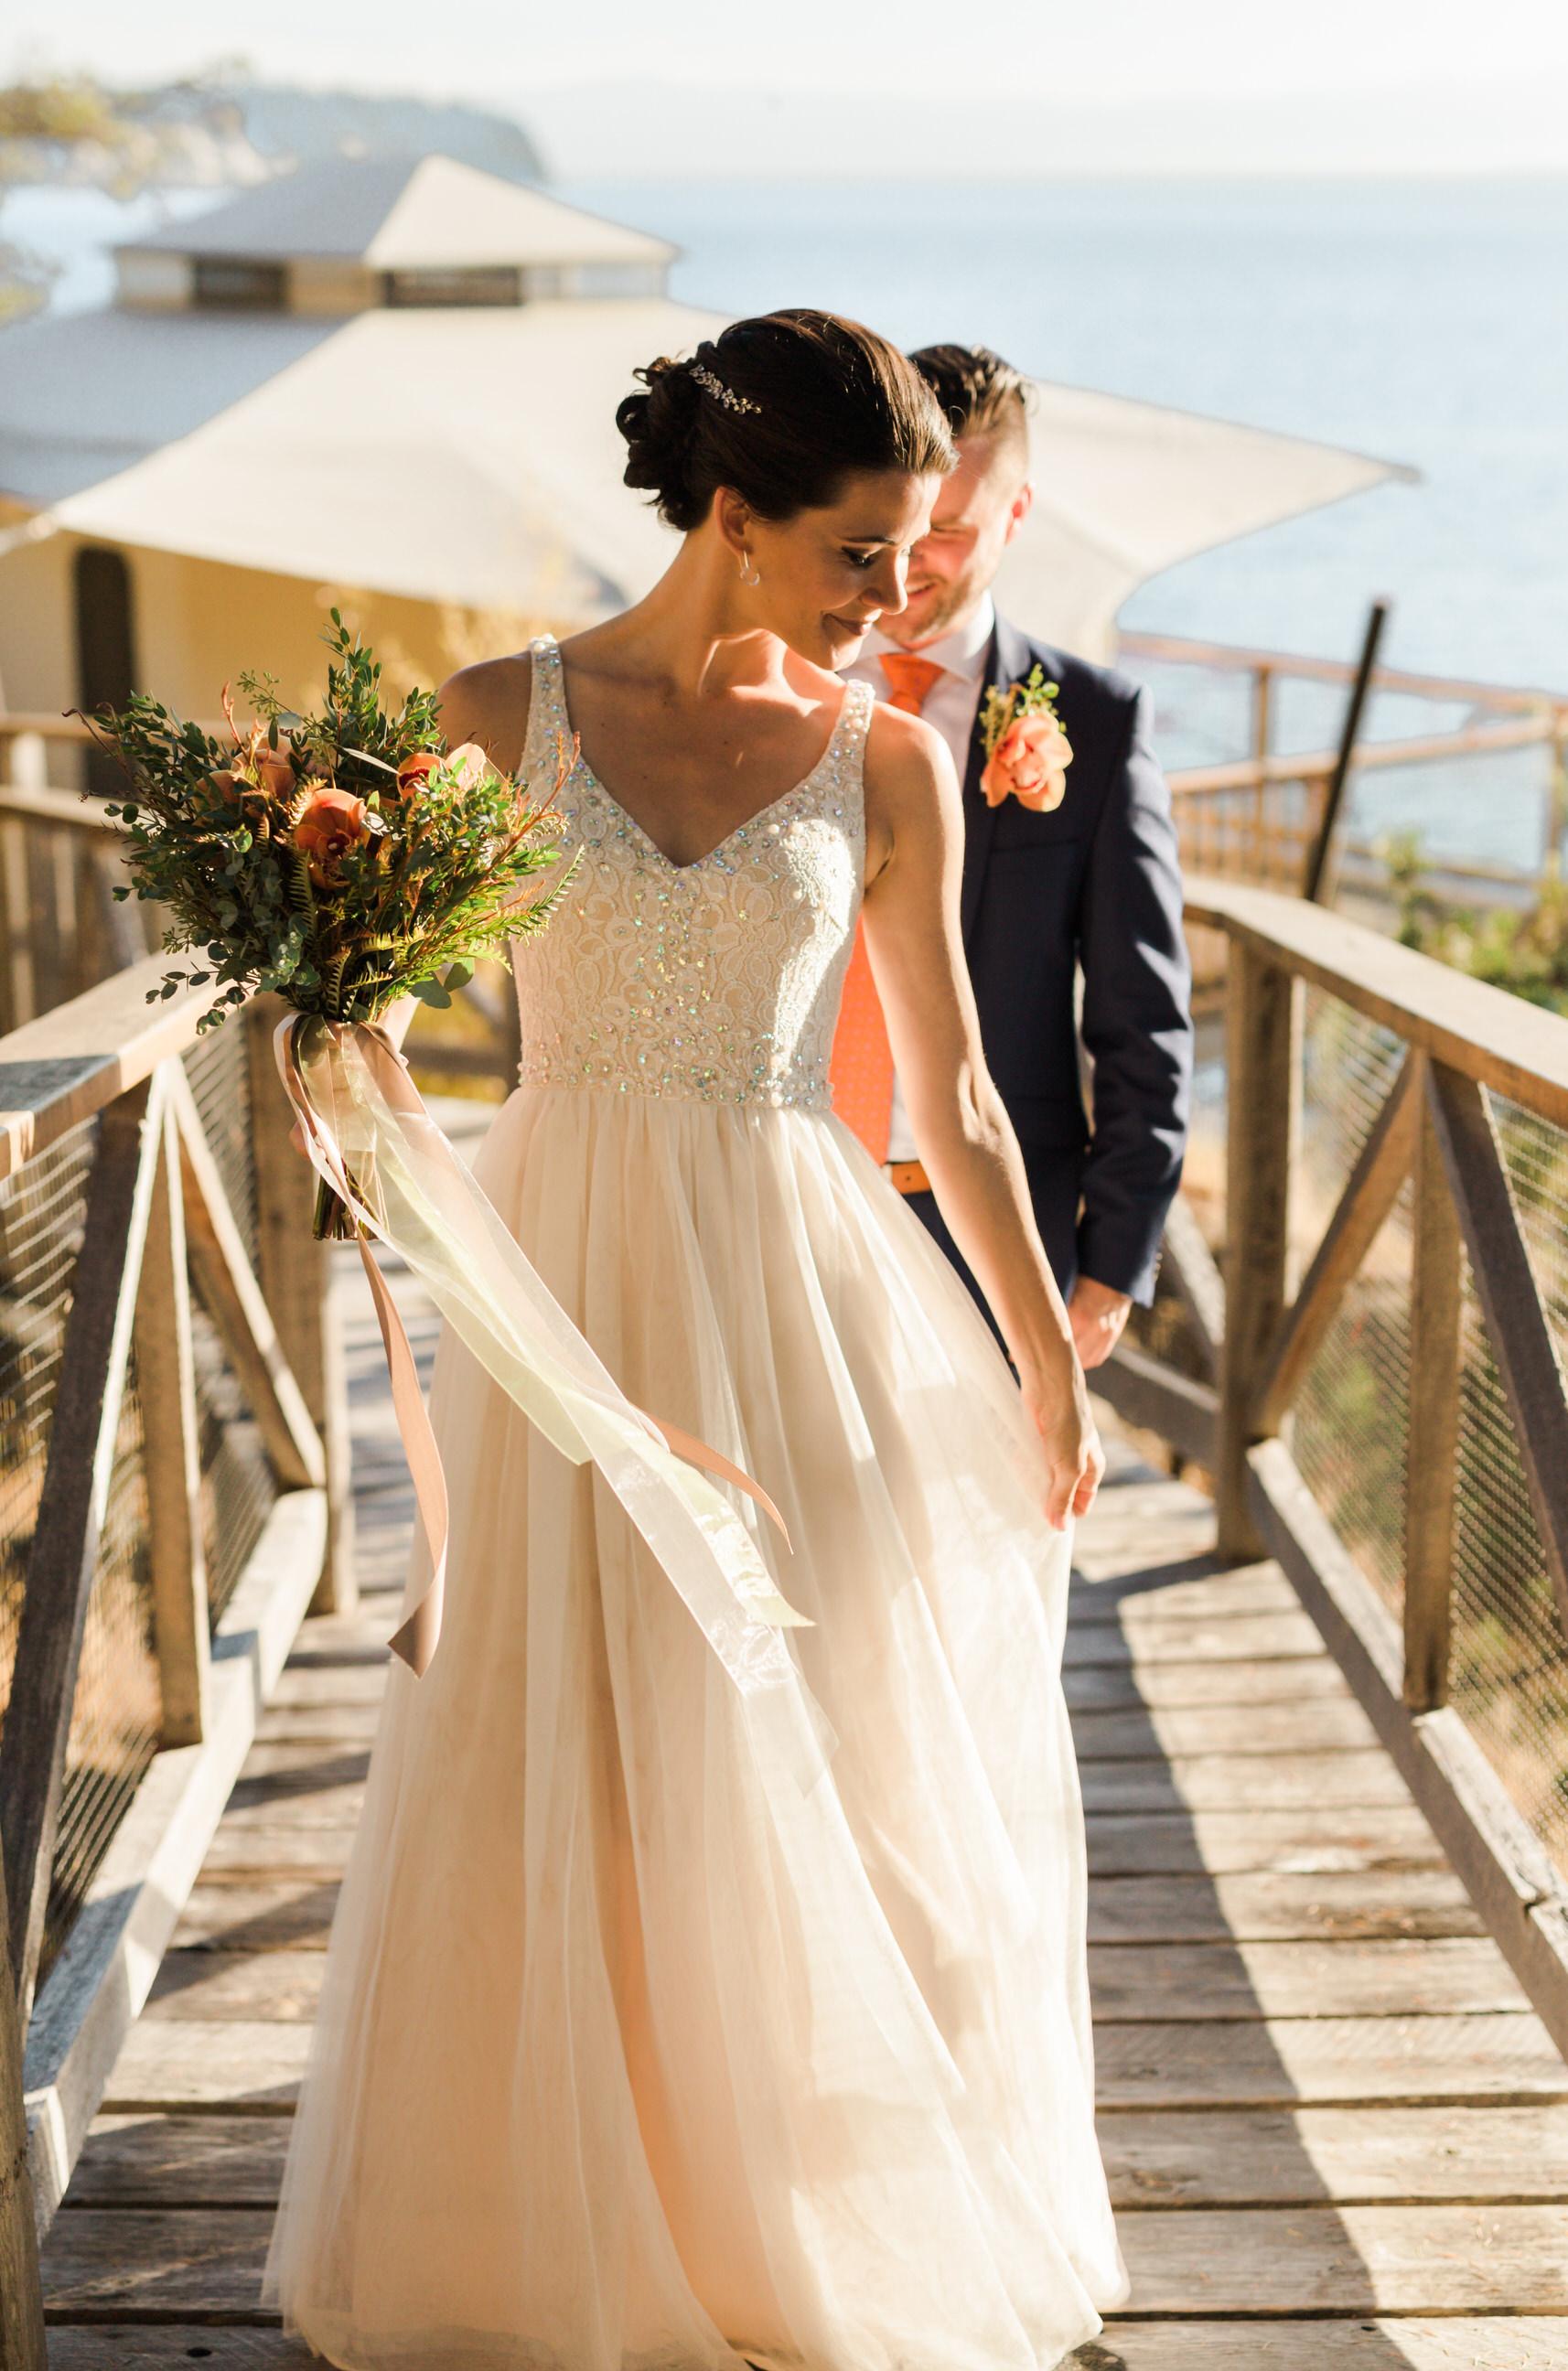 Rockwater Secret Cove Resort Wedding - Sunshine Coast BC Wedding Photographer - Vancouver Wedding Photographer - Sunshine Coast Elopement Photos - IMG_0257.jpg